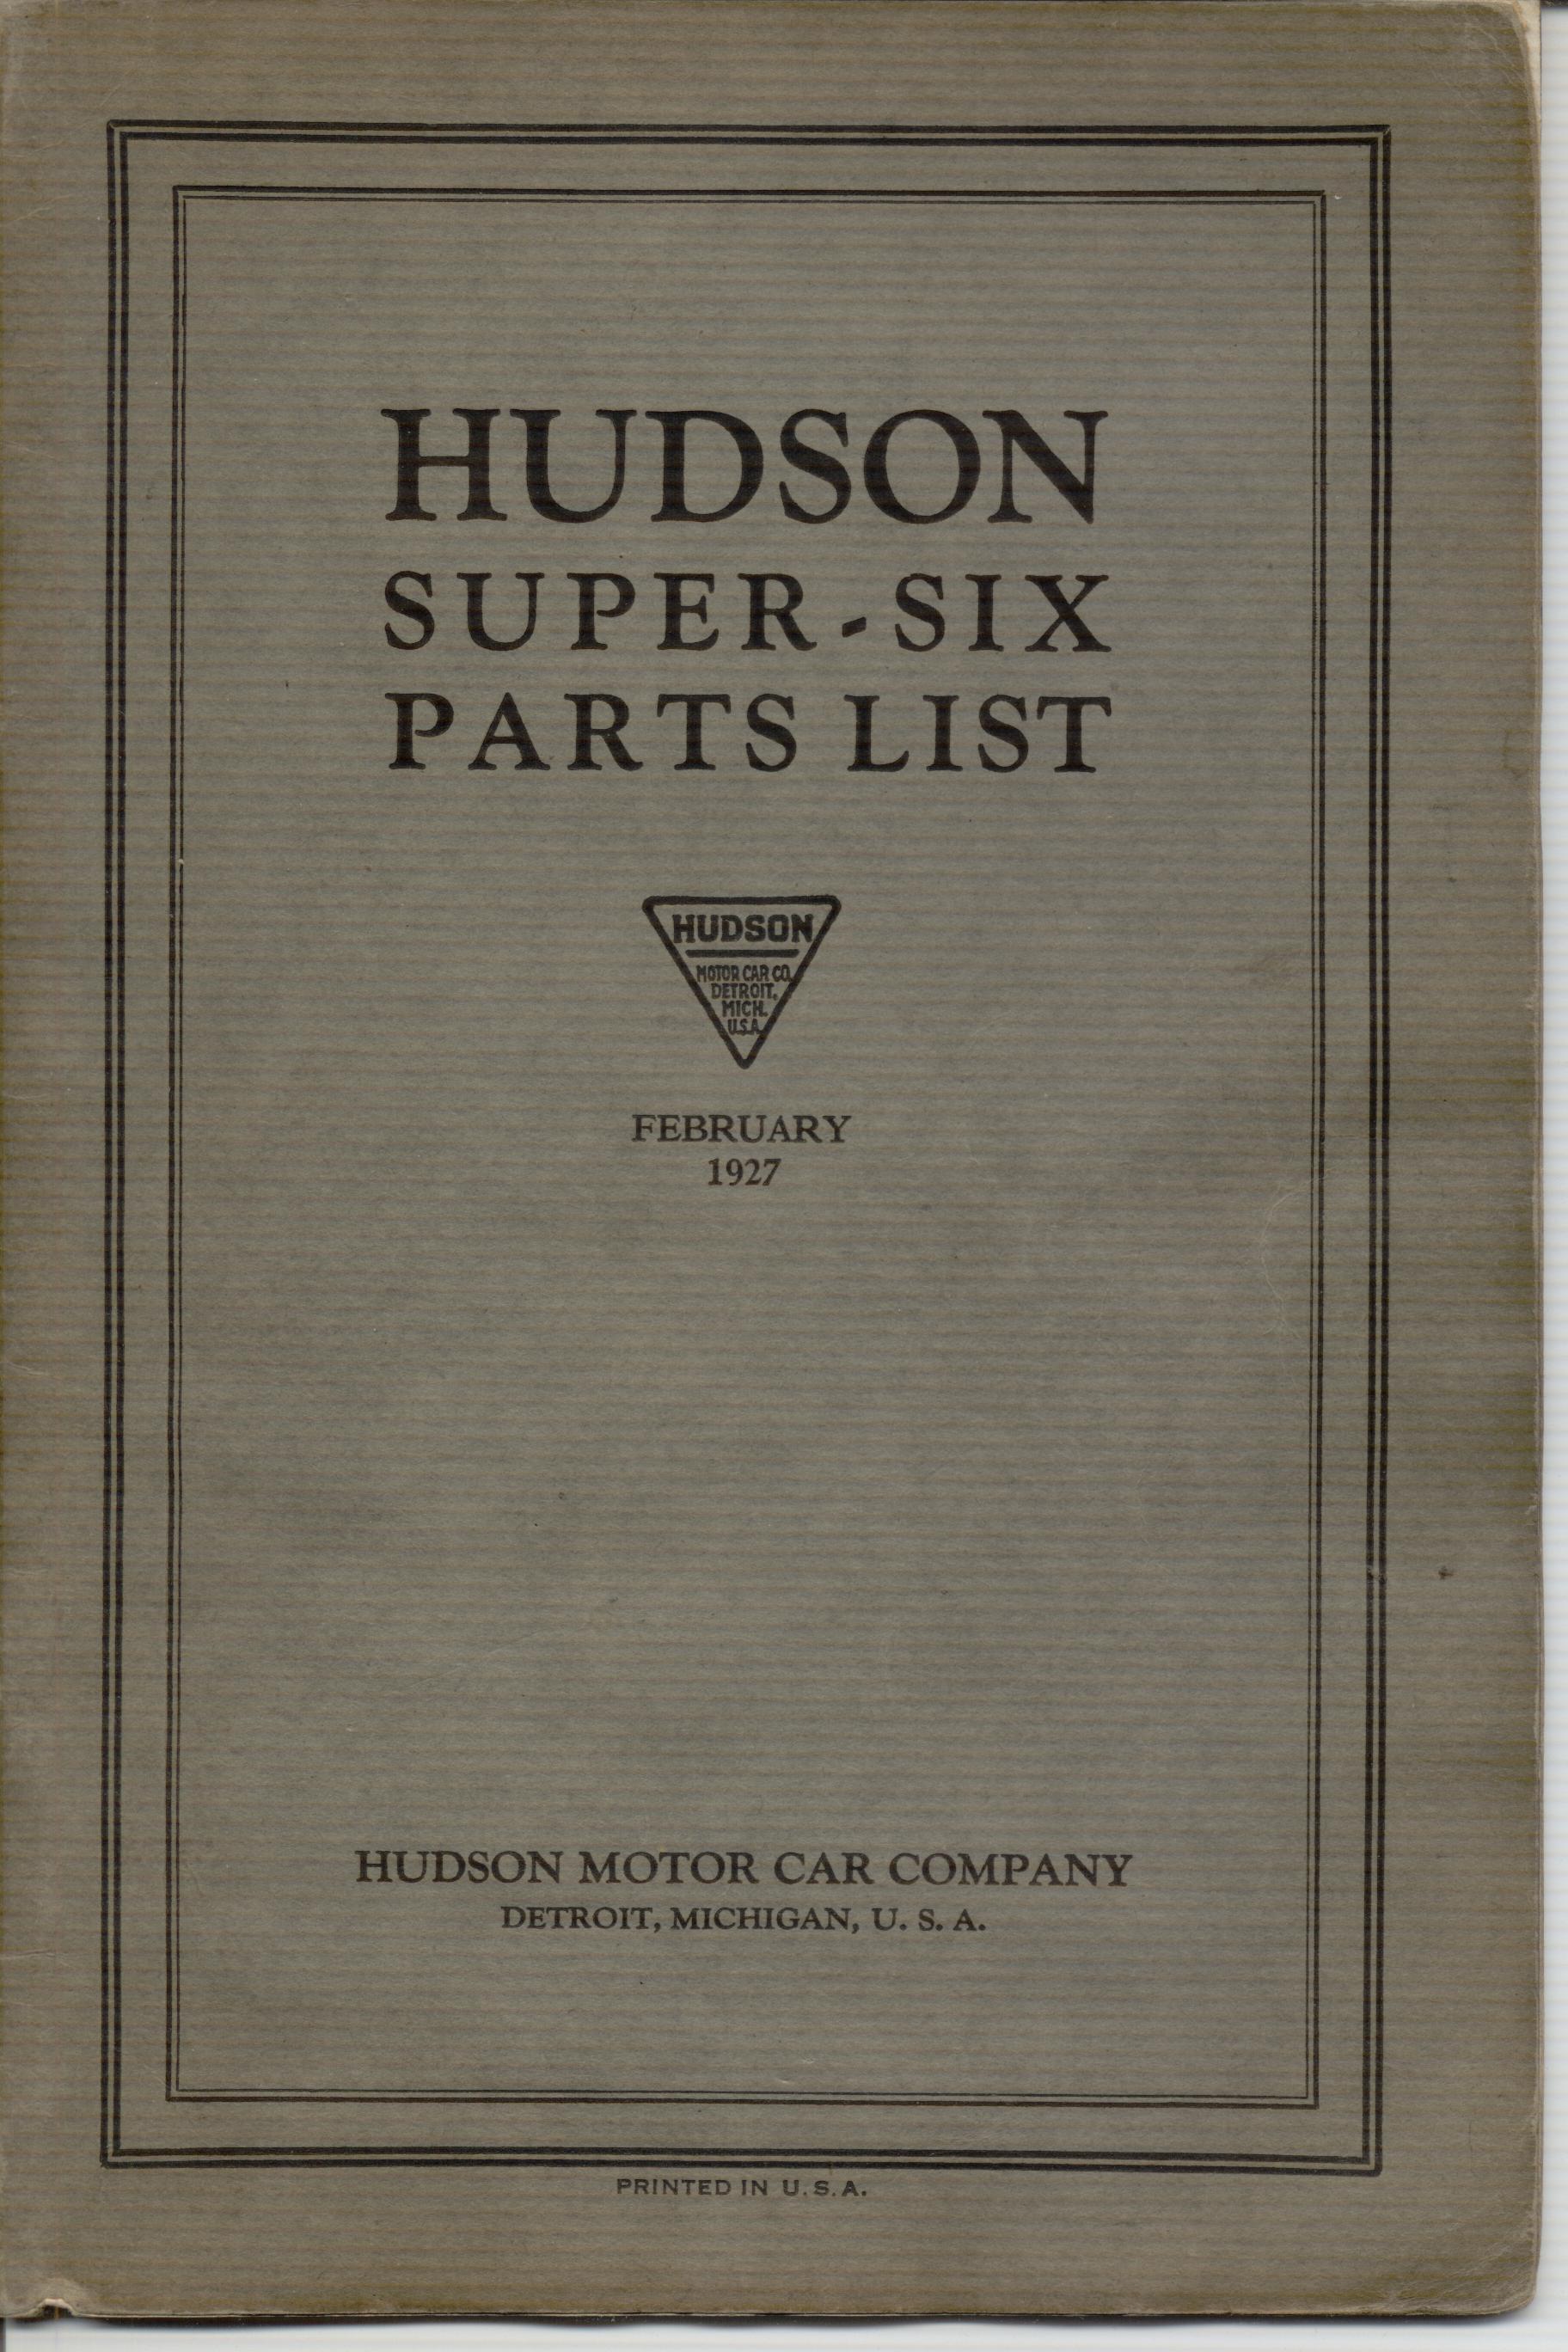 Hudson Manuals Tech Index Charging Circuit Diagram For The 1953 Oldsmobile All Models Super Six Parts List Feb 1927